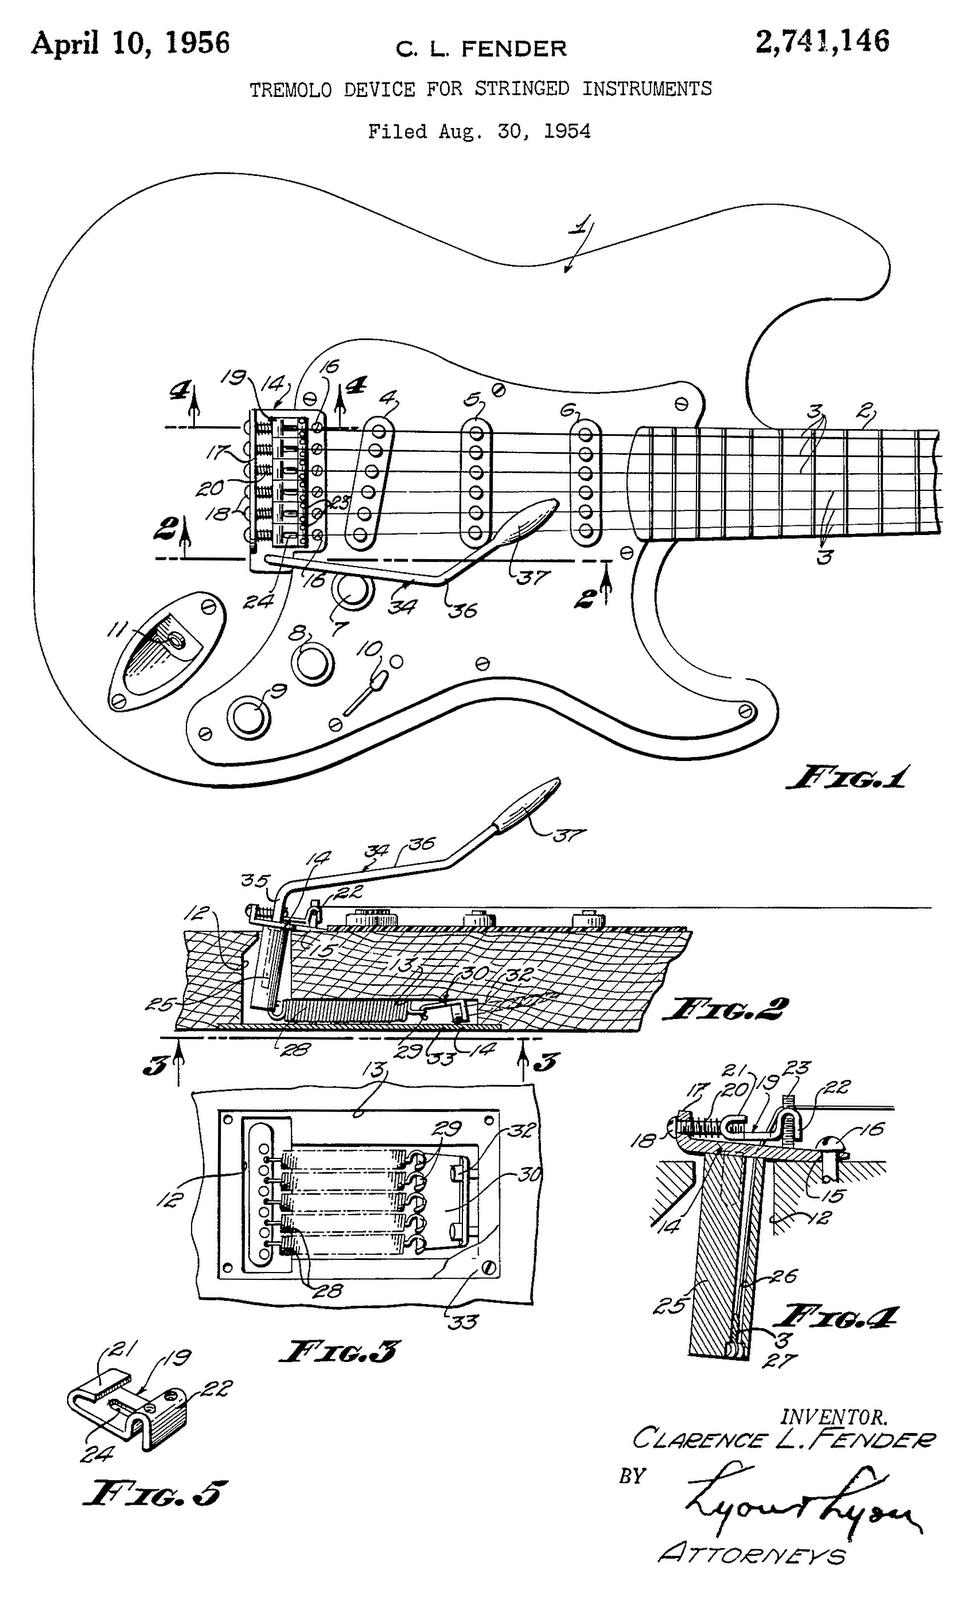 wiring diagram stratocaster whammy bar wiring diagram compilation fender stratocaster tremolo wiring diagram [ 973 x 1600 Pixel ]